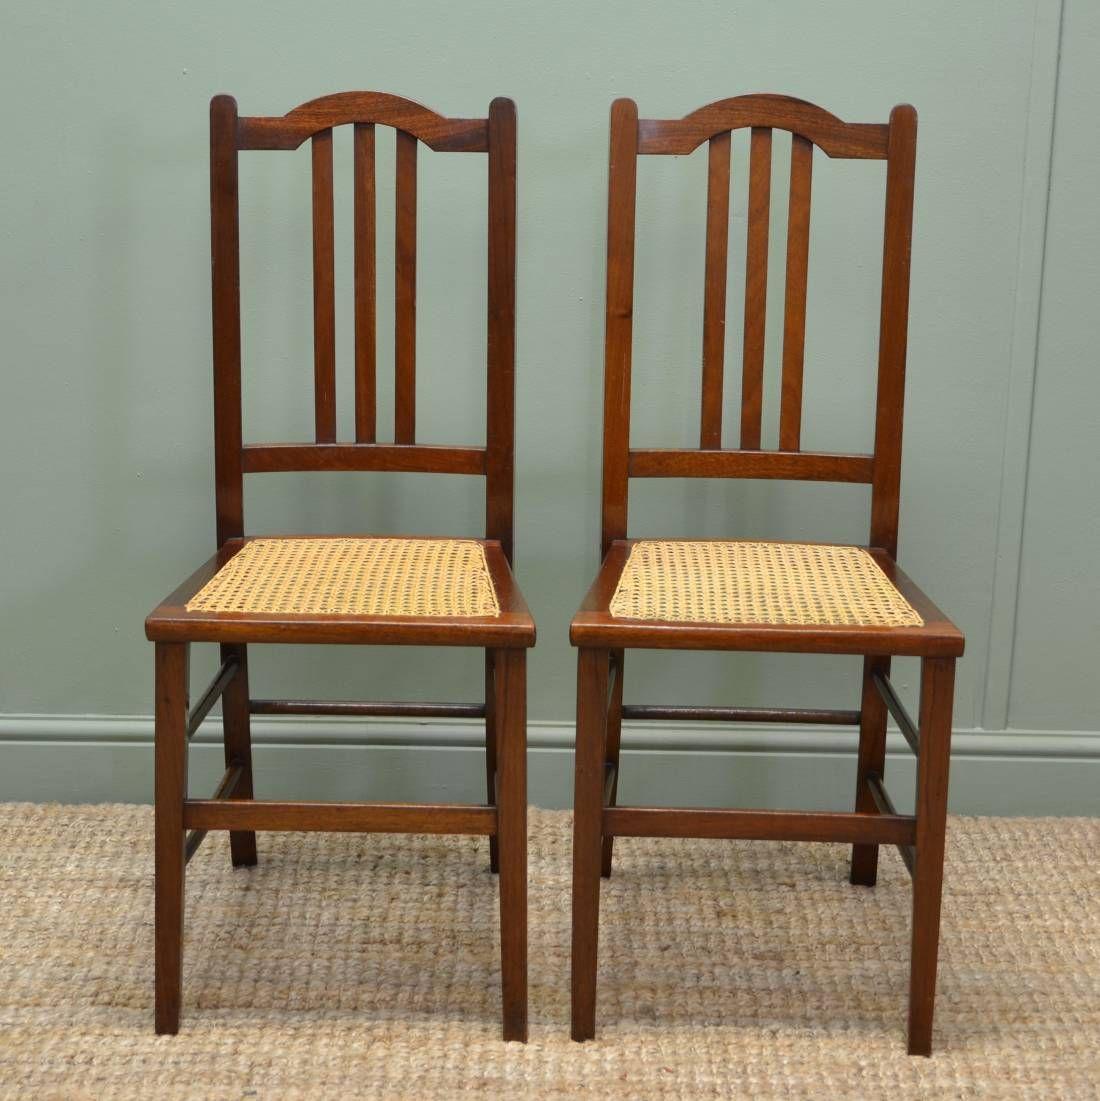 Amazing Furniture · Edwardian Era Furniture